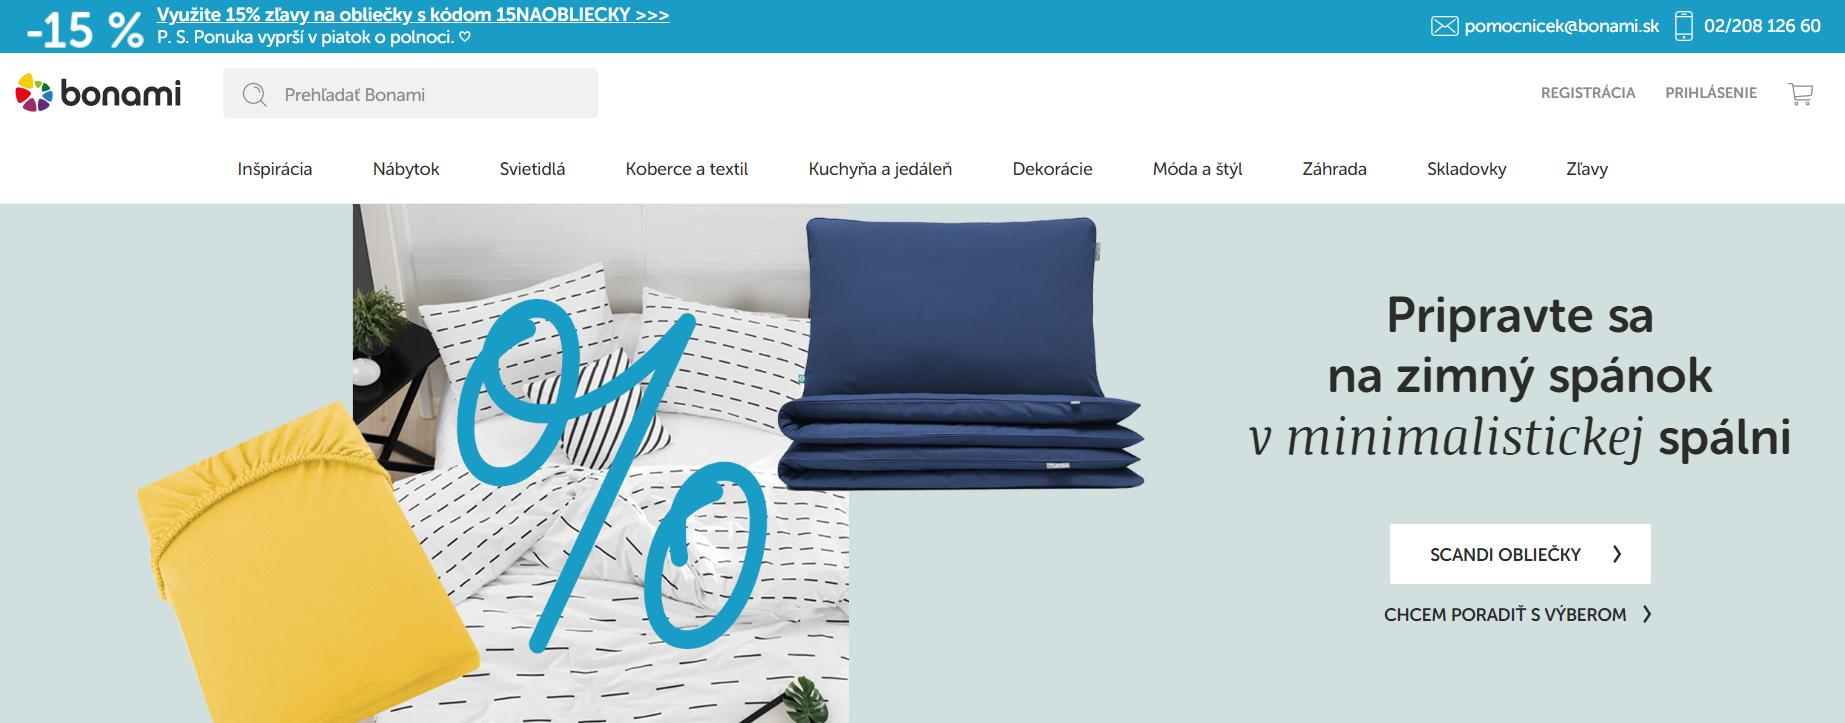 Internetový obchod Bonami.sk